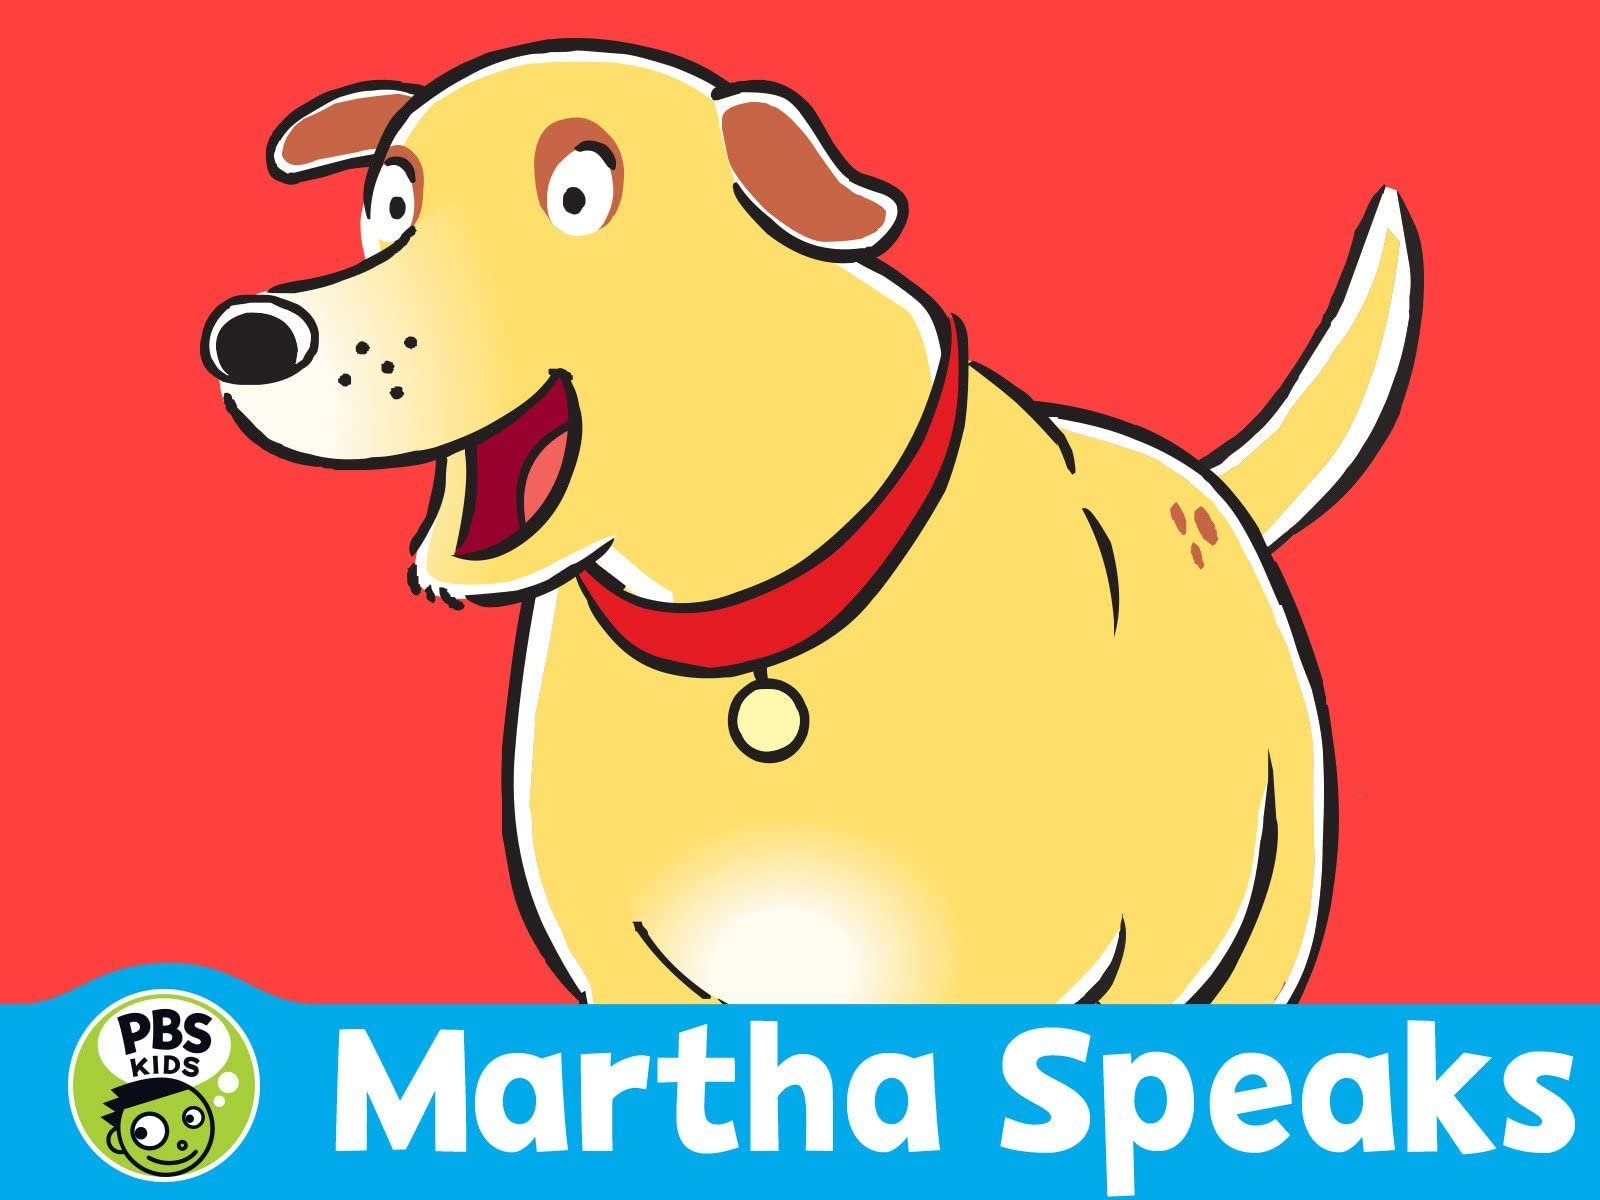 Martha Speaks Tv Guide - Owners Manual Book •